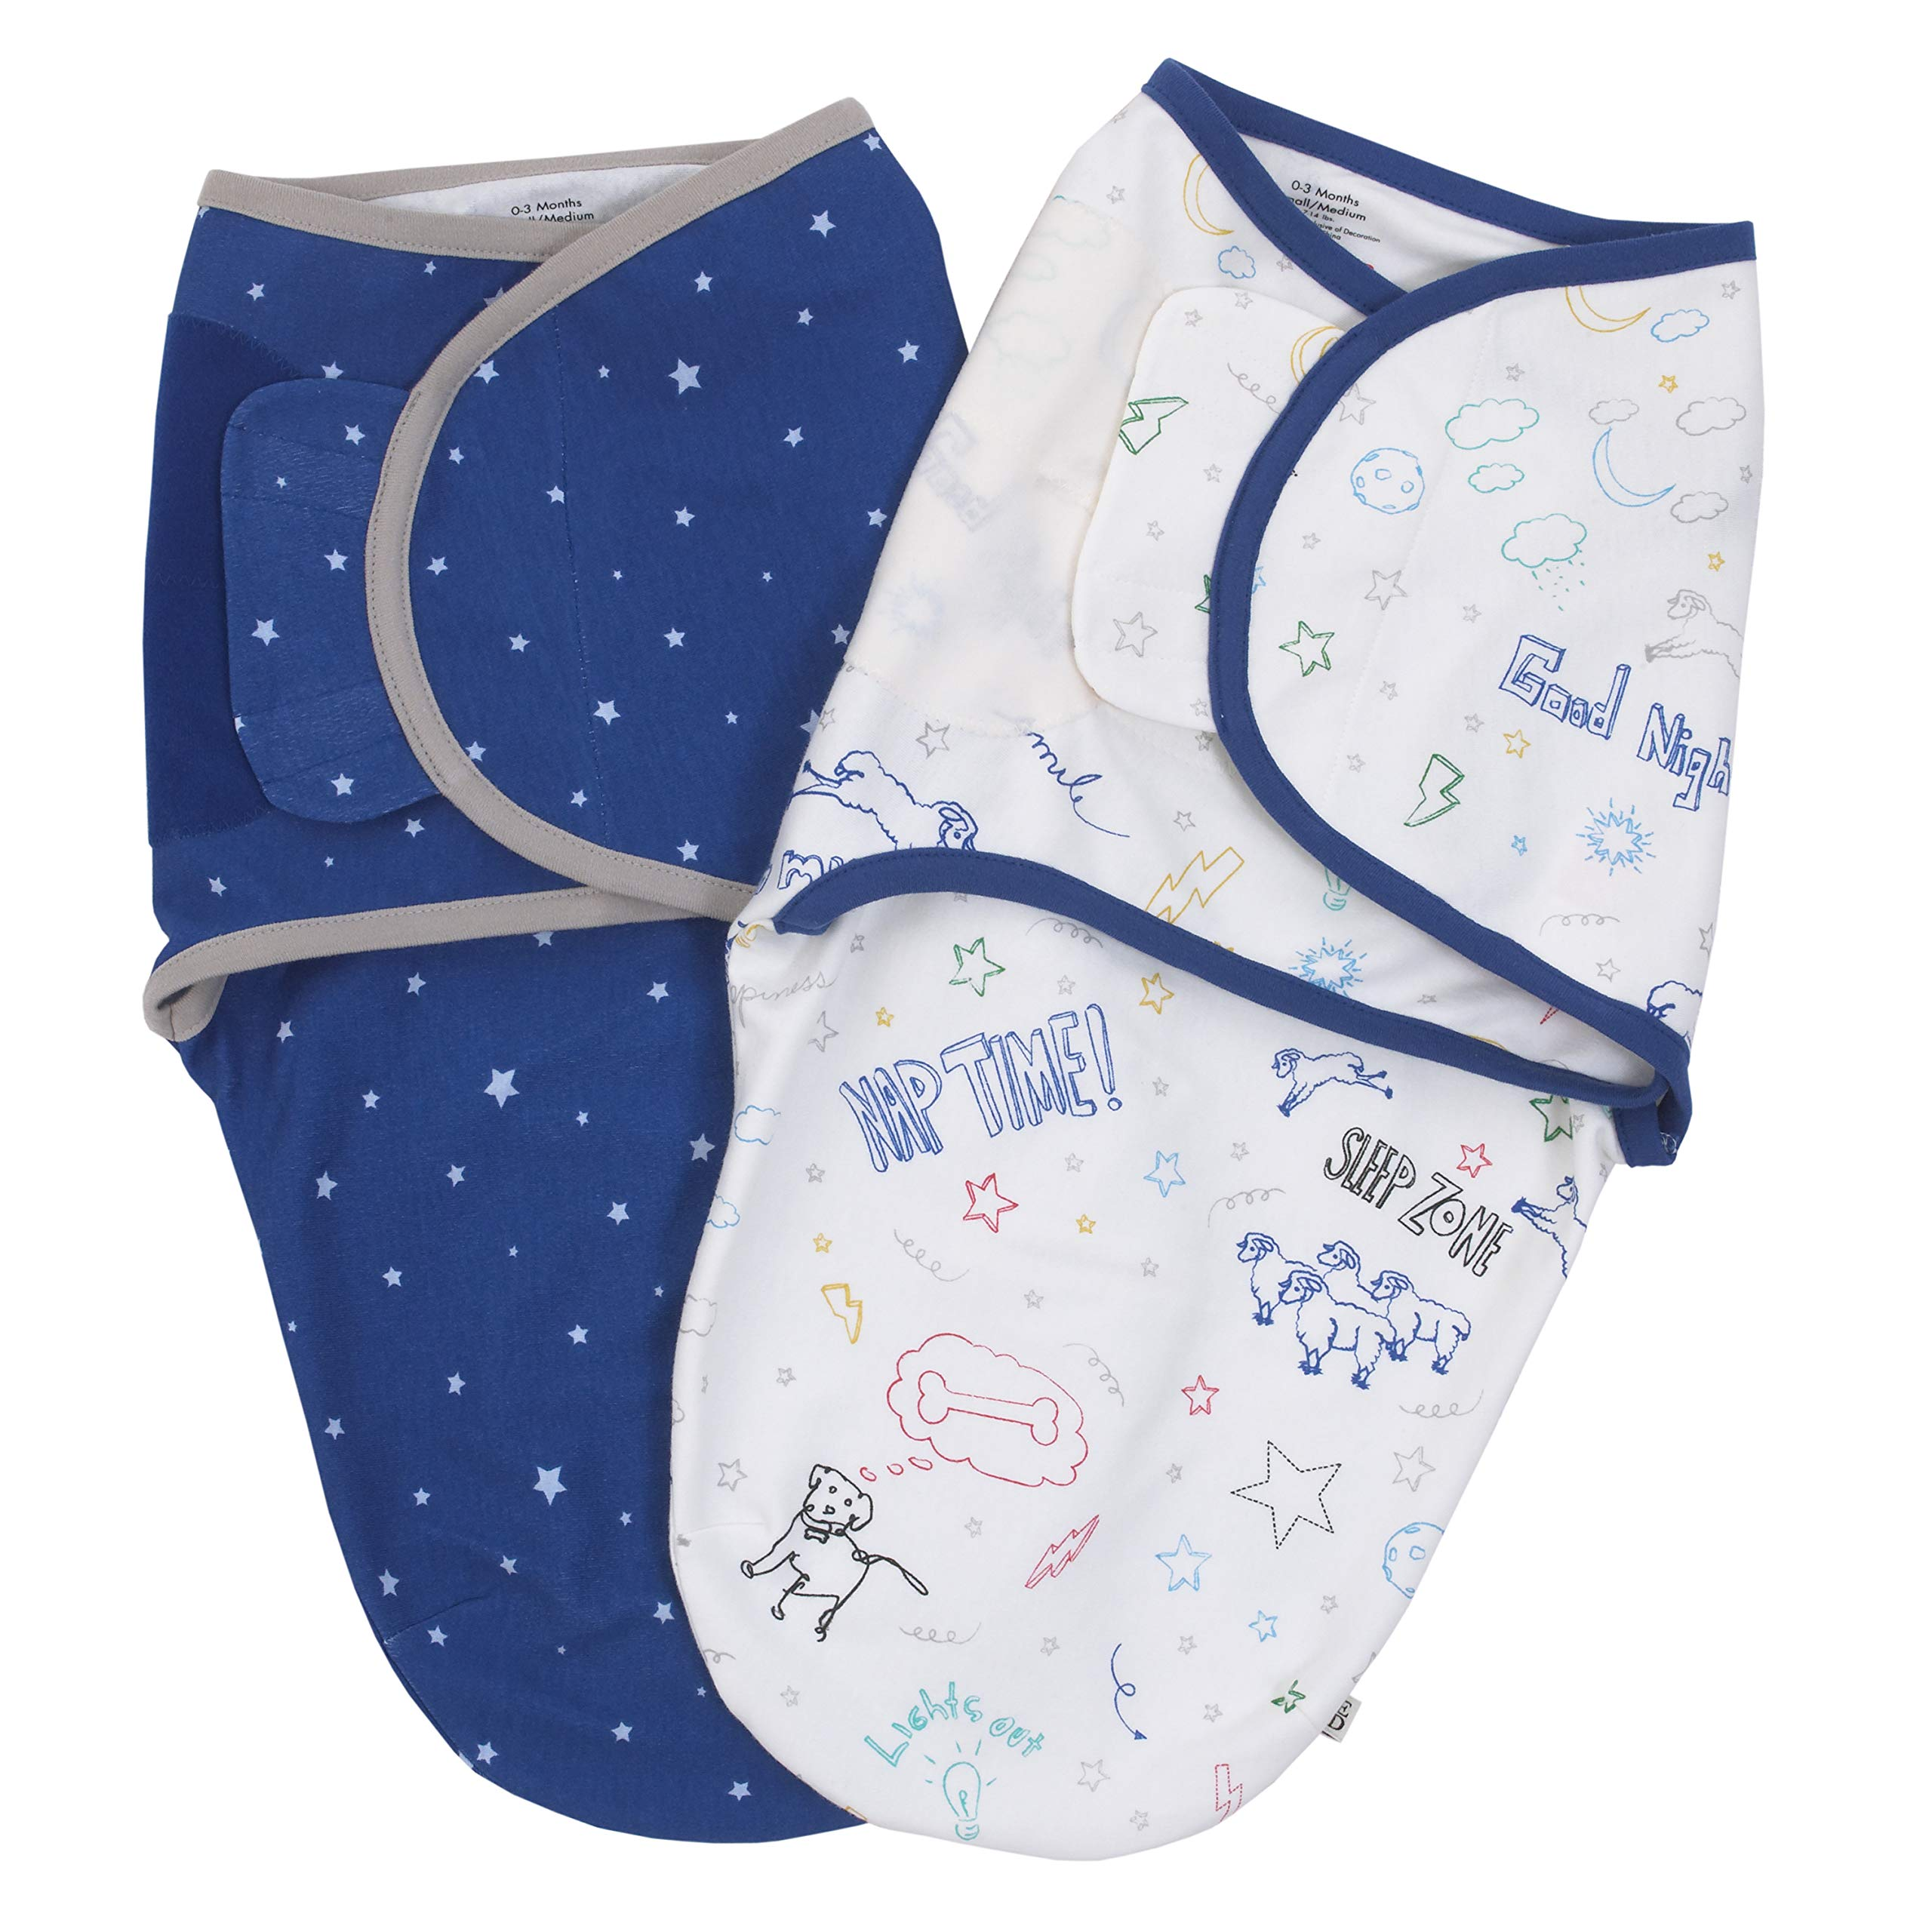 ED Ellen DeGeneres Doodle Dog - Soft 100% Cotton Knit Navy, Grey Stars & All-Over Doodle Print 2 Pack Swaddle Baby Blankets, Navy, White, Red, Yellow by ED Ellen DeGeneres